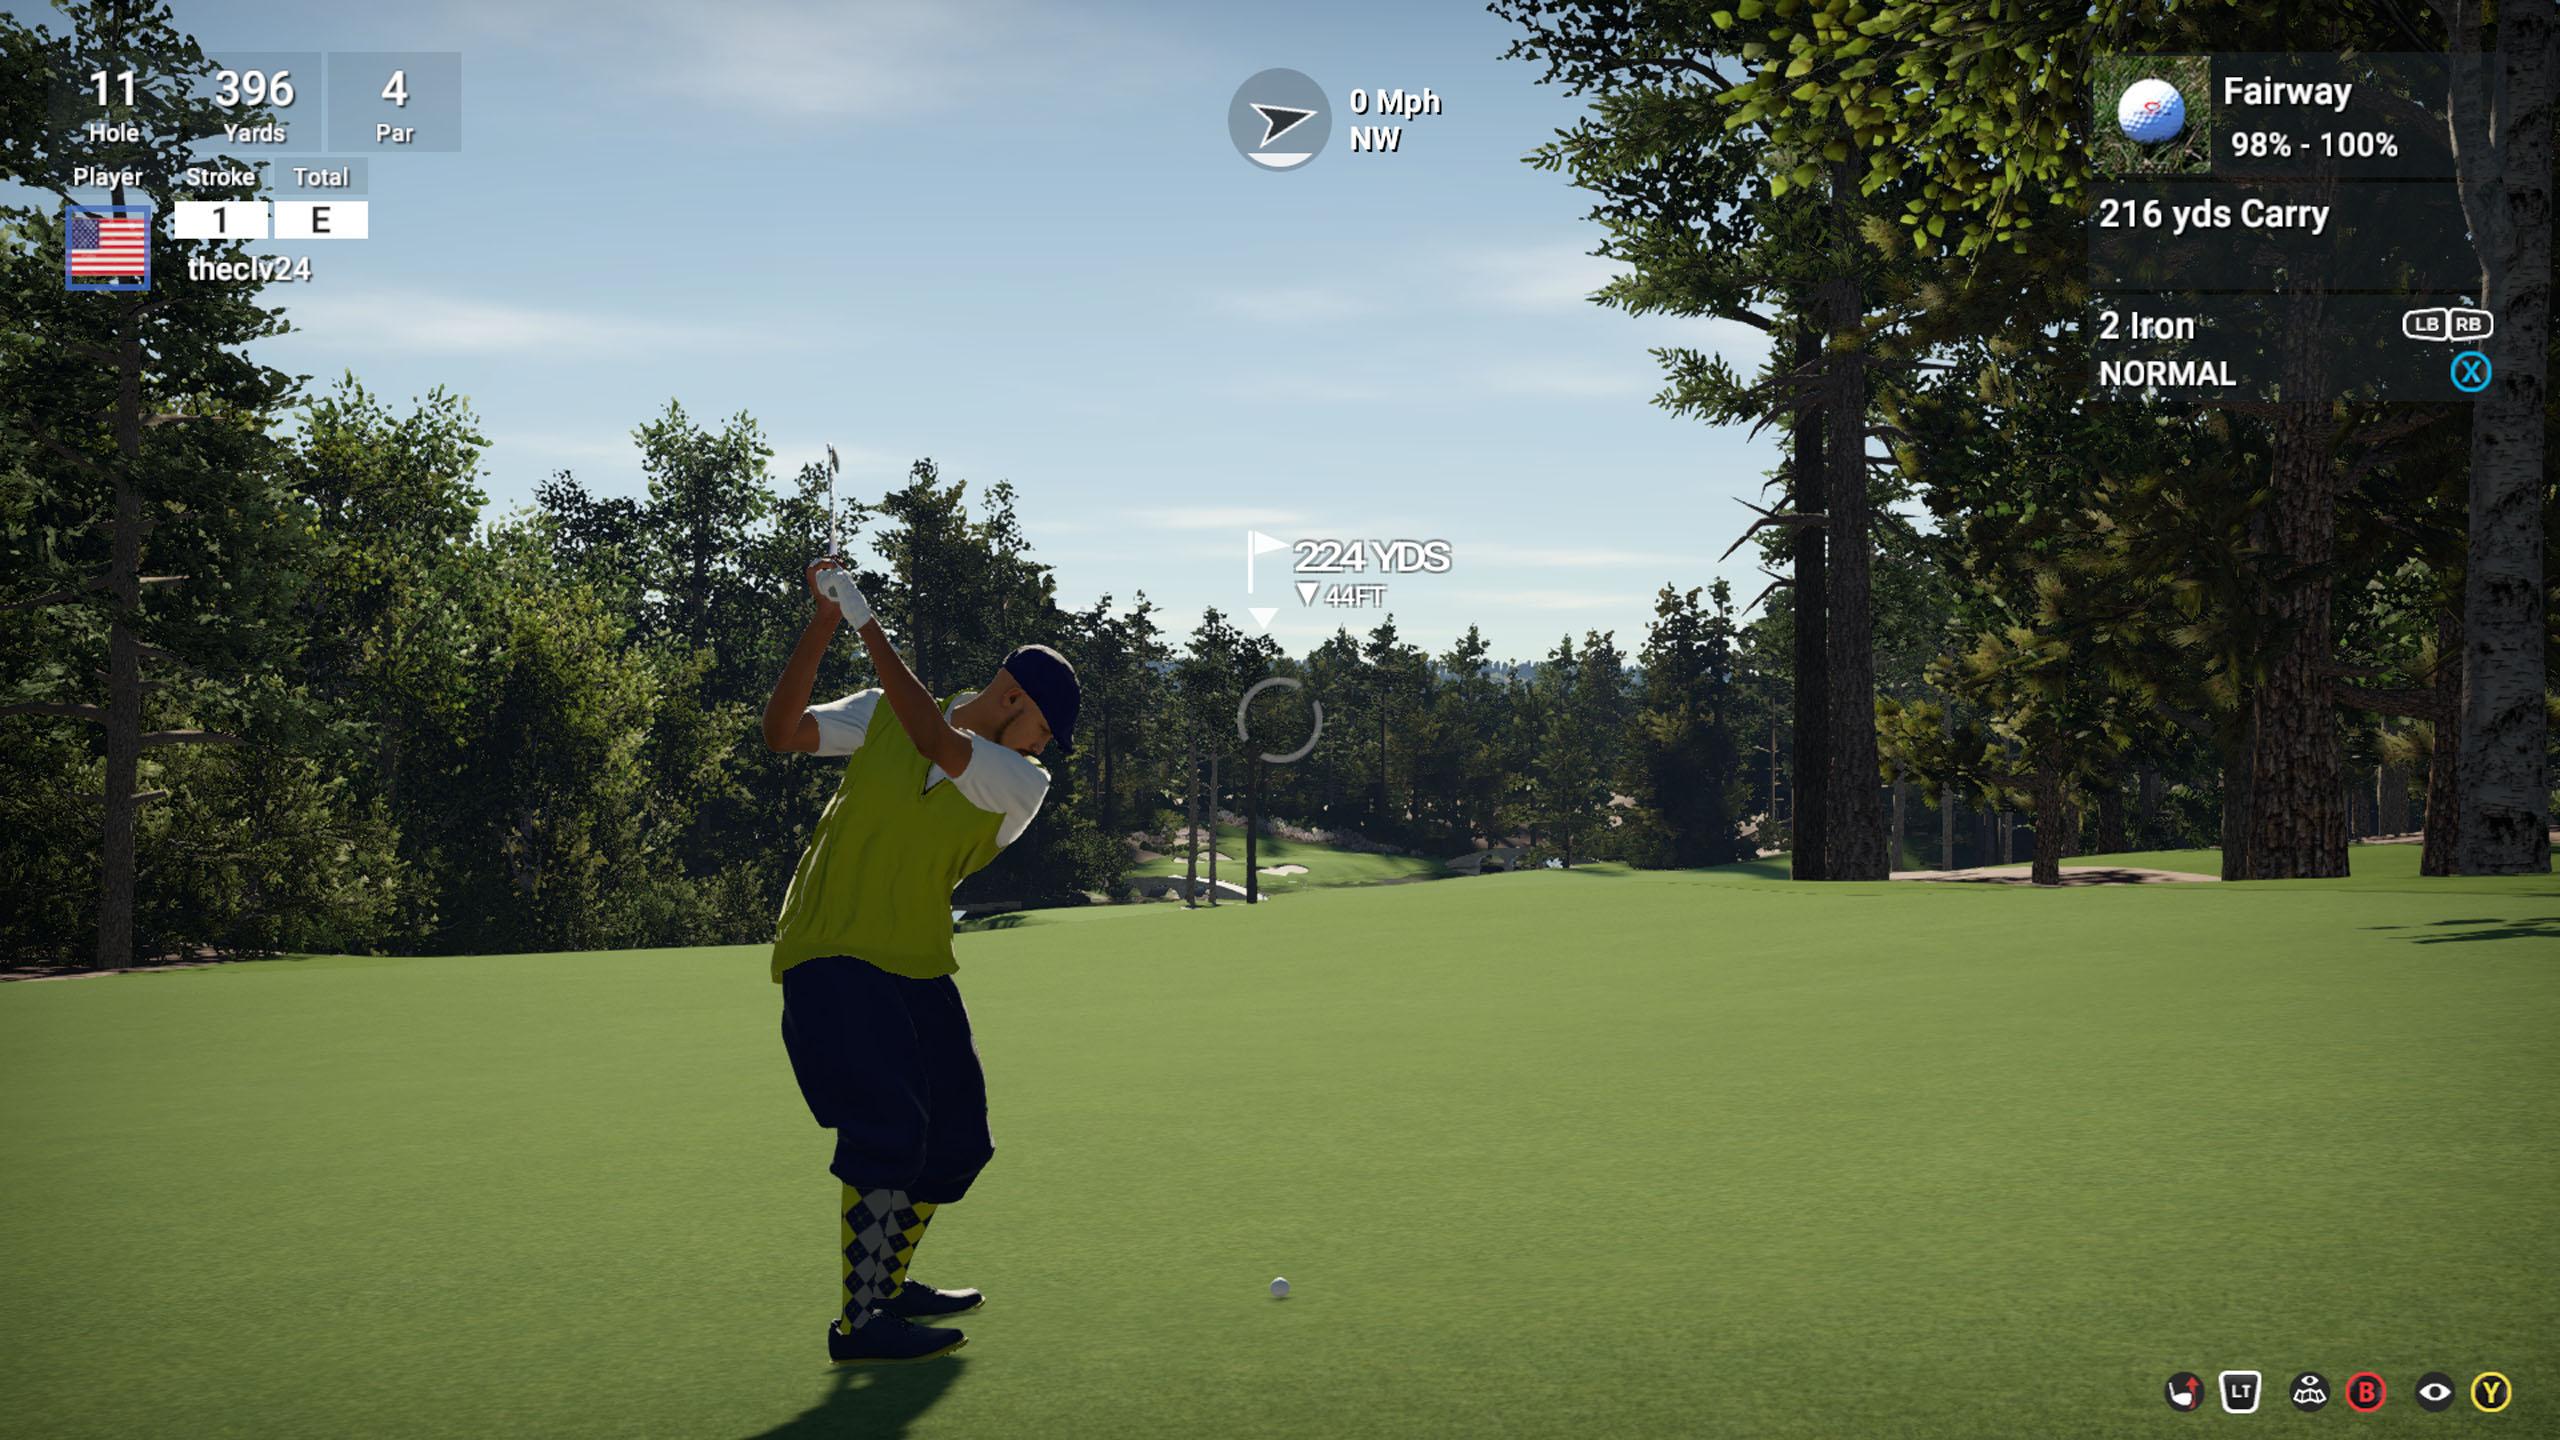 The Golf Club Screenshot 2018.05.09 - 13.26.11.91